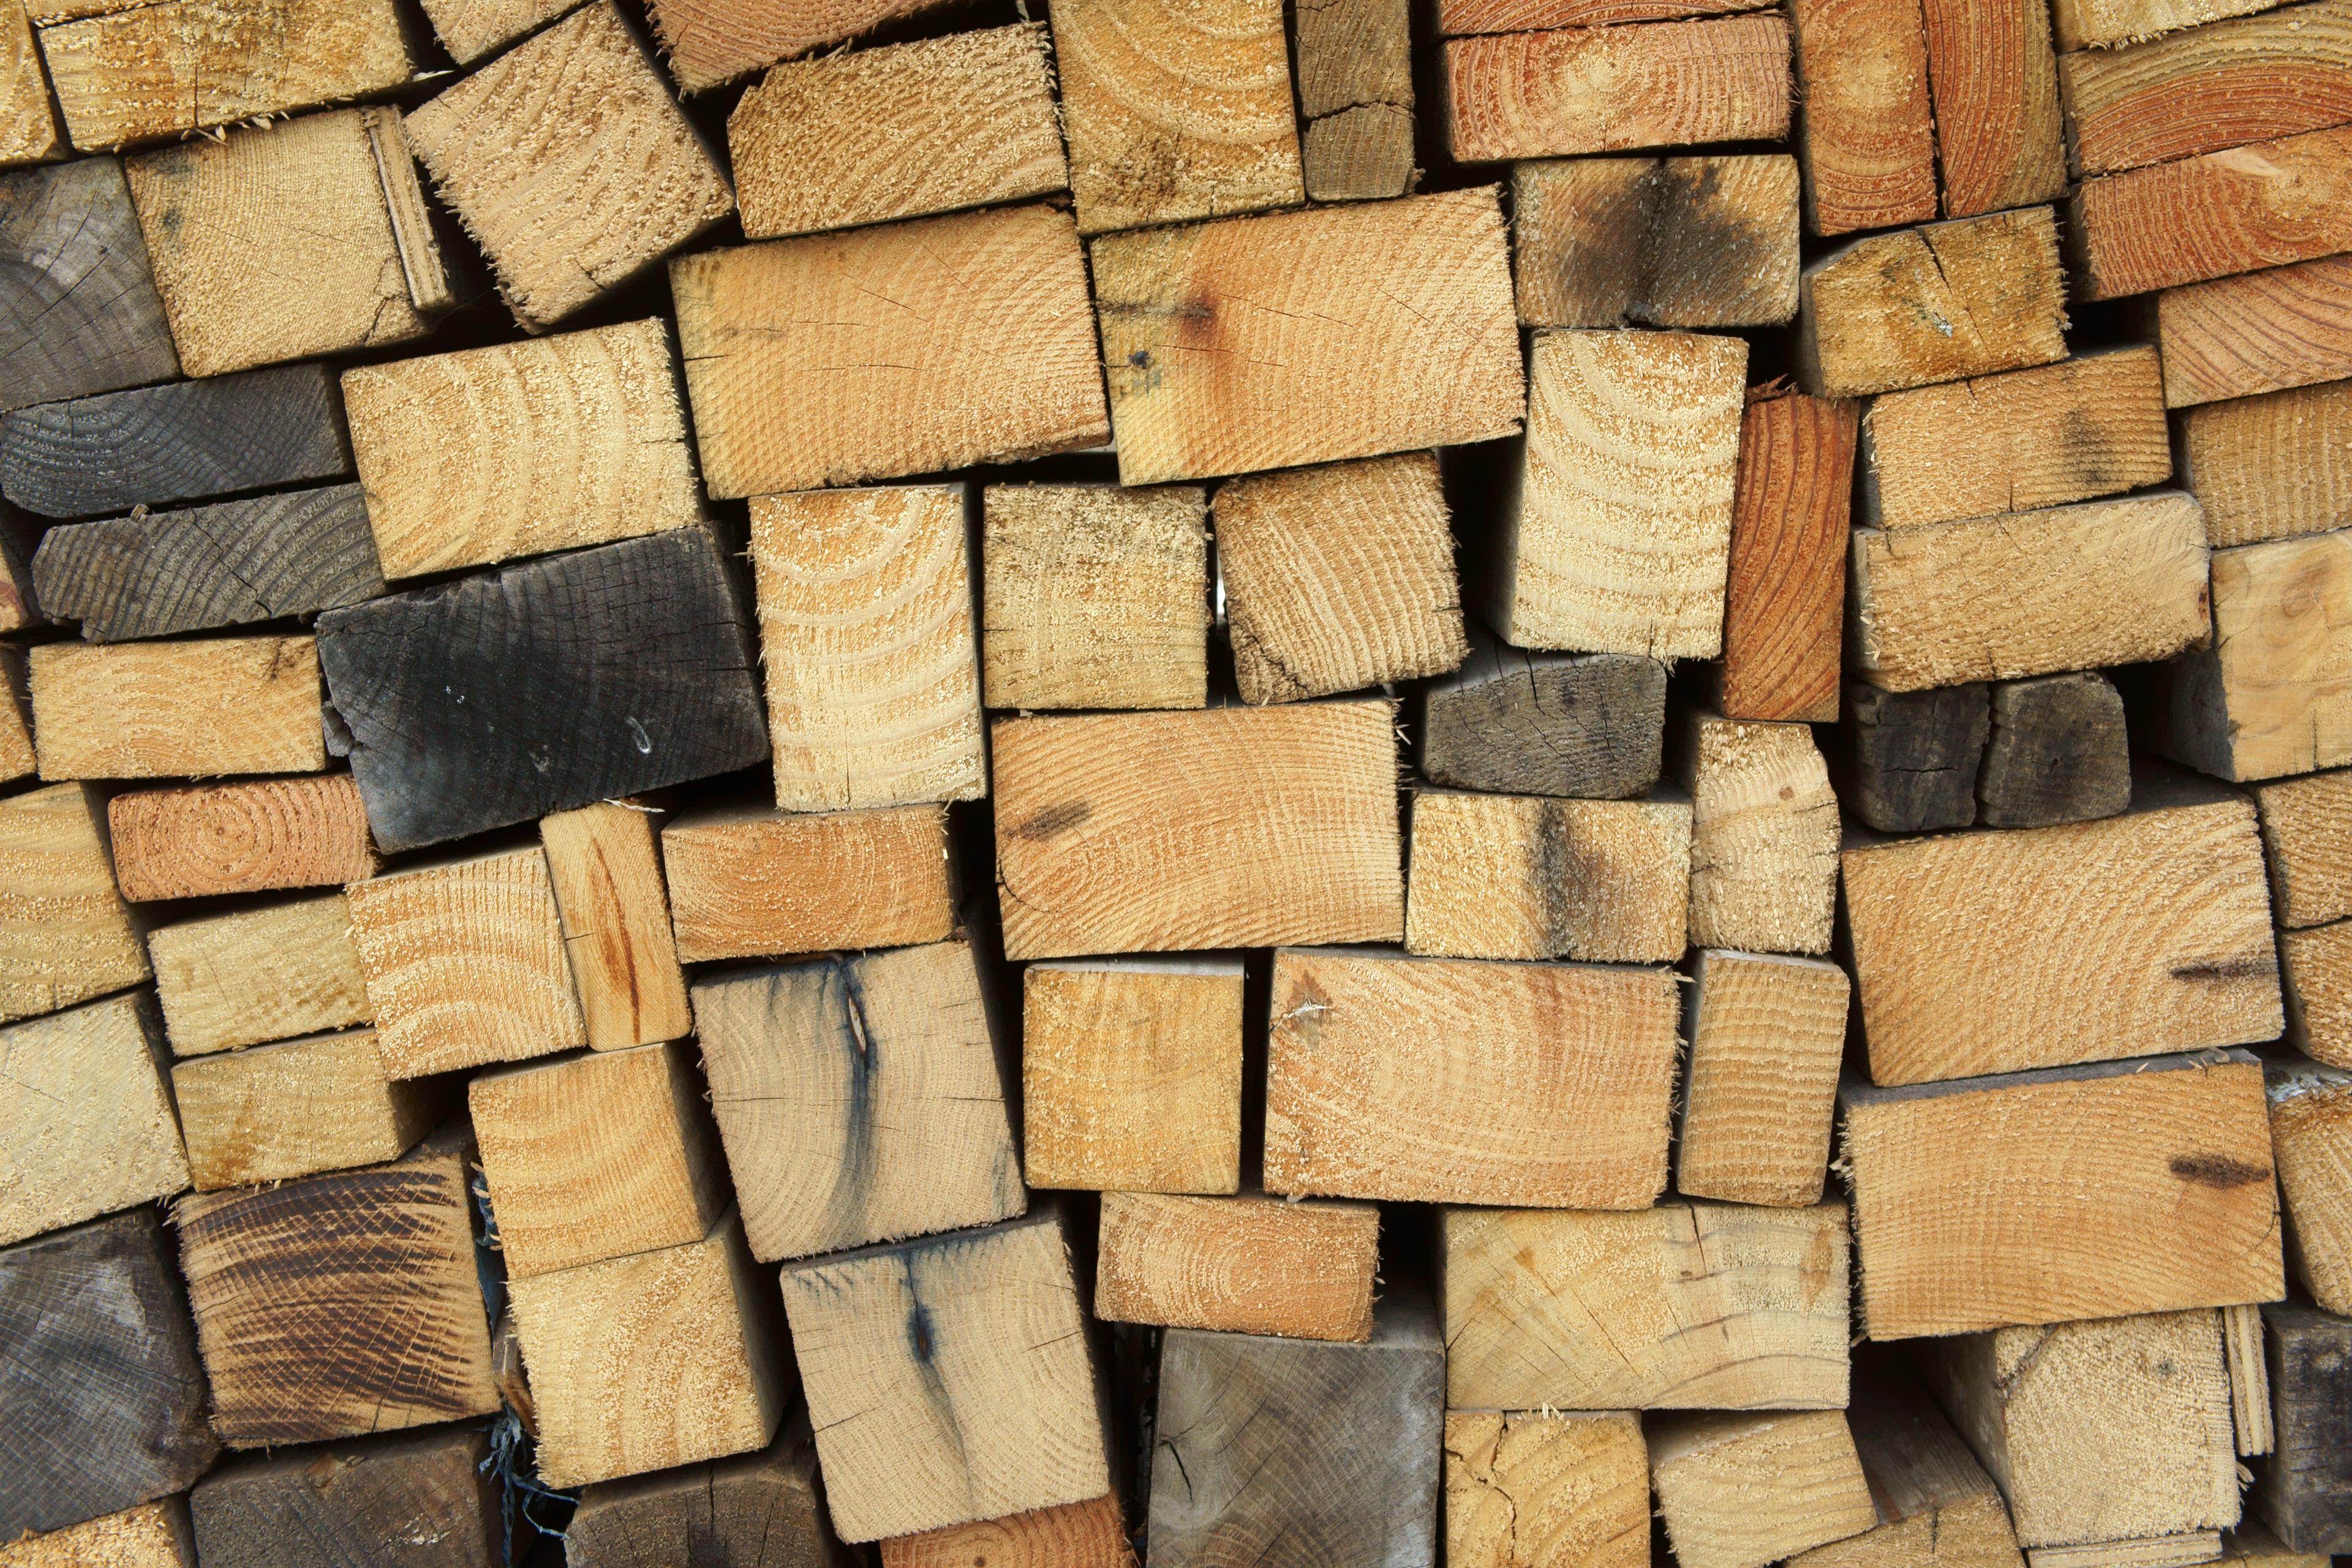 Free Images : wood, texture, floor, log, pattern, square, soil, tile ...